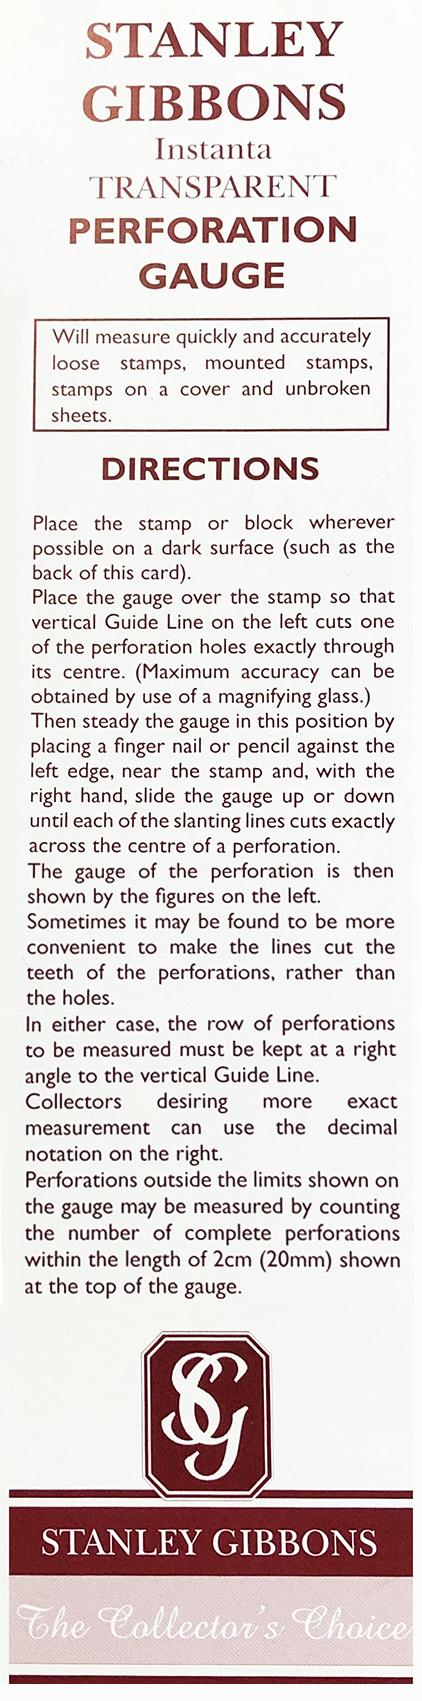 Instanta Perforation Gauge